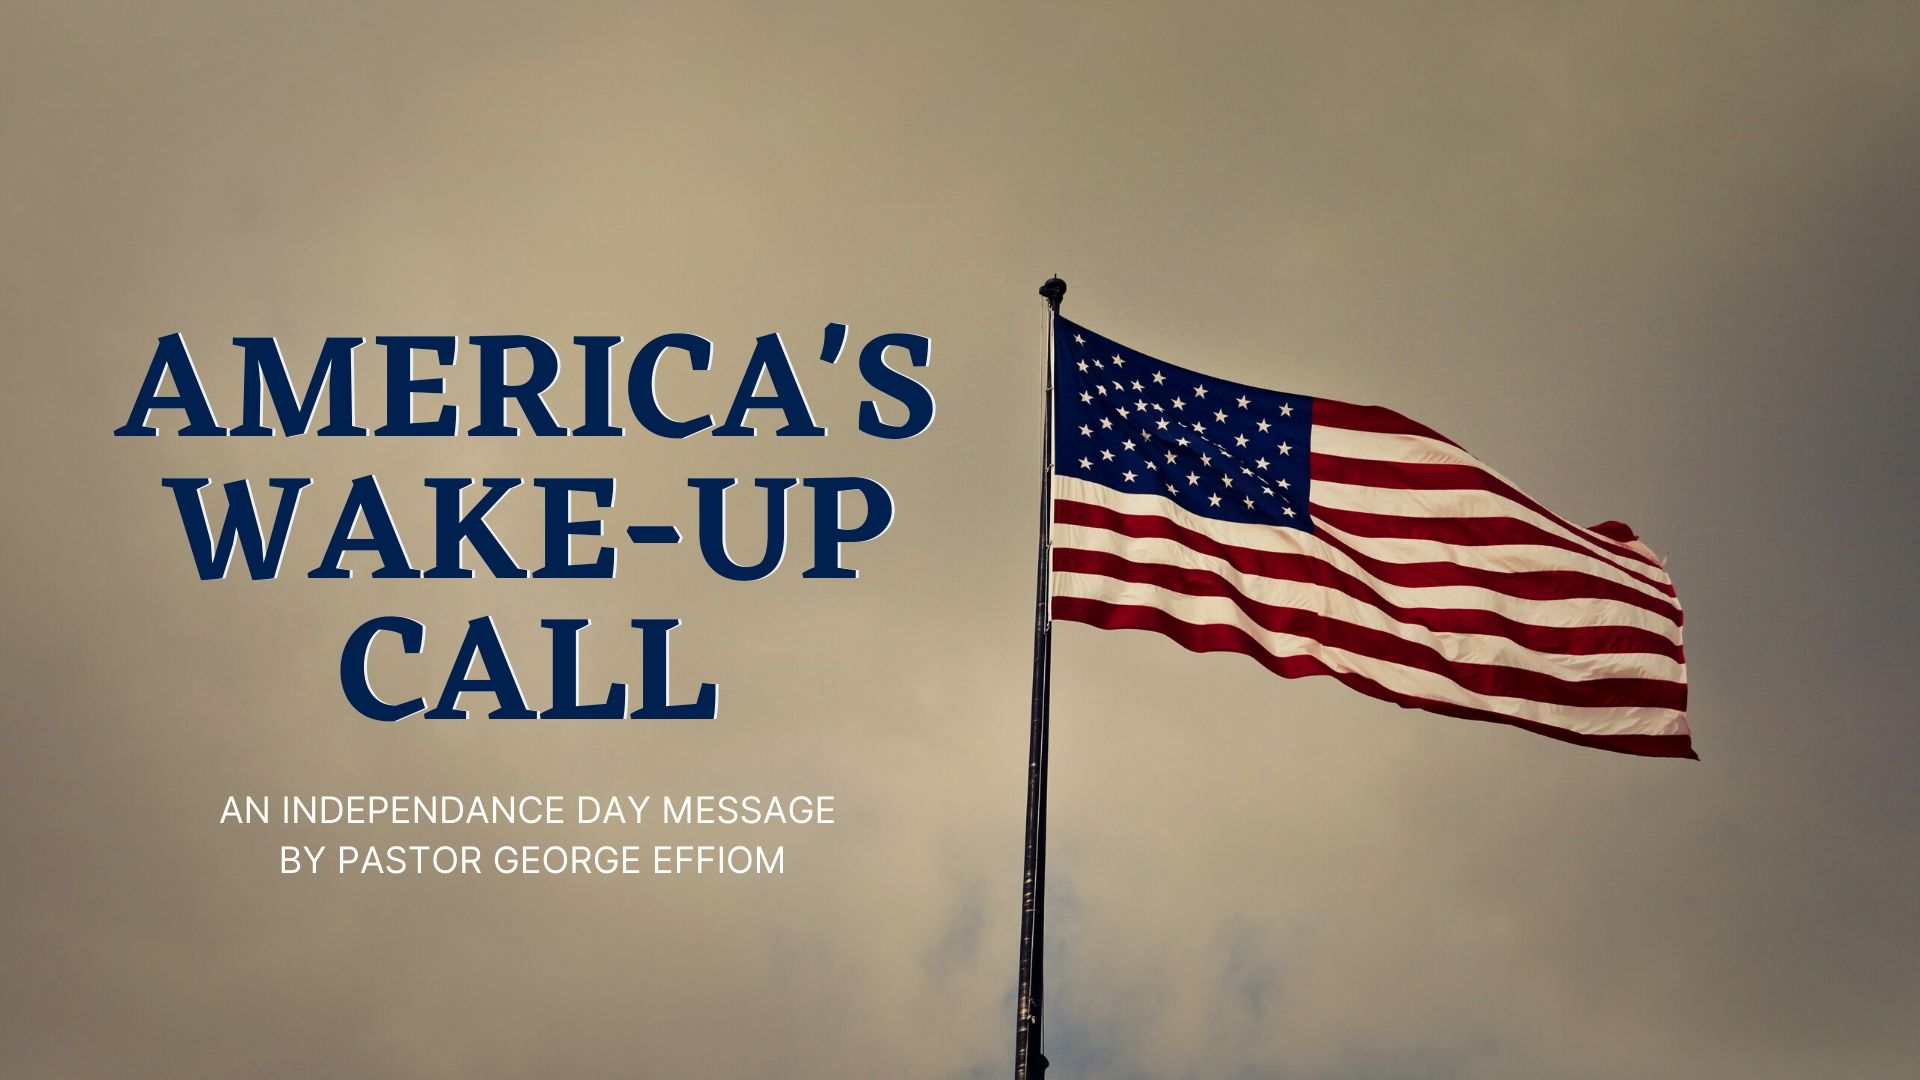 America's Wake-Up Call